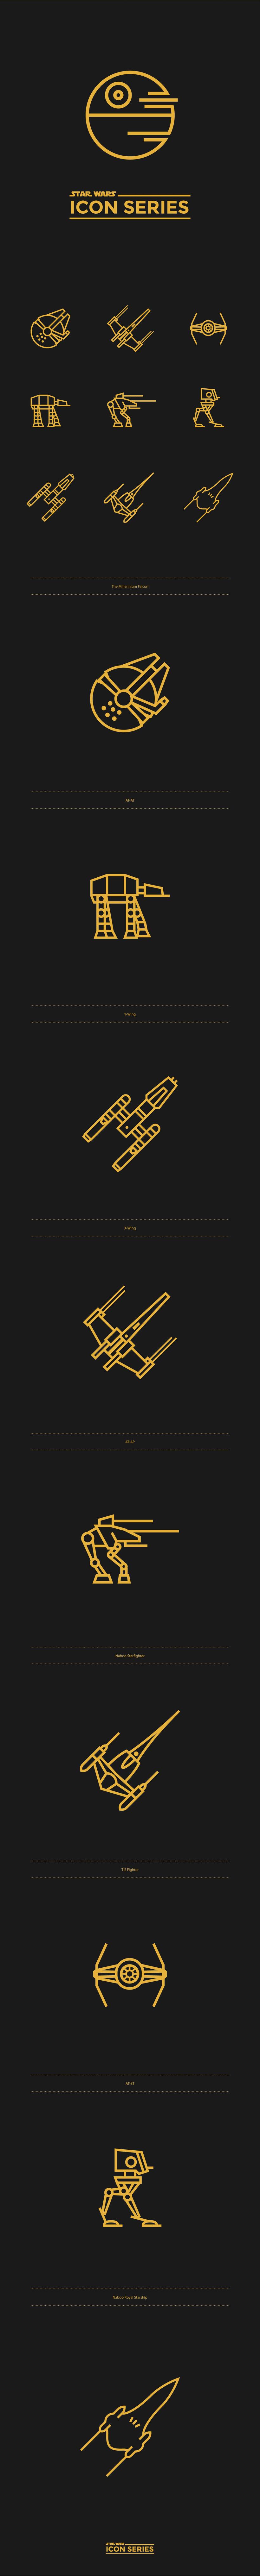 Star Wars Icon Series -1